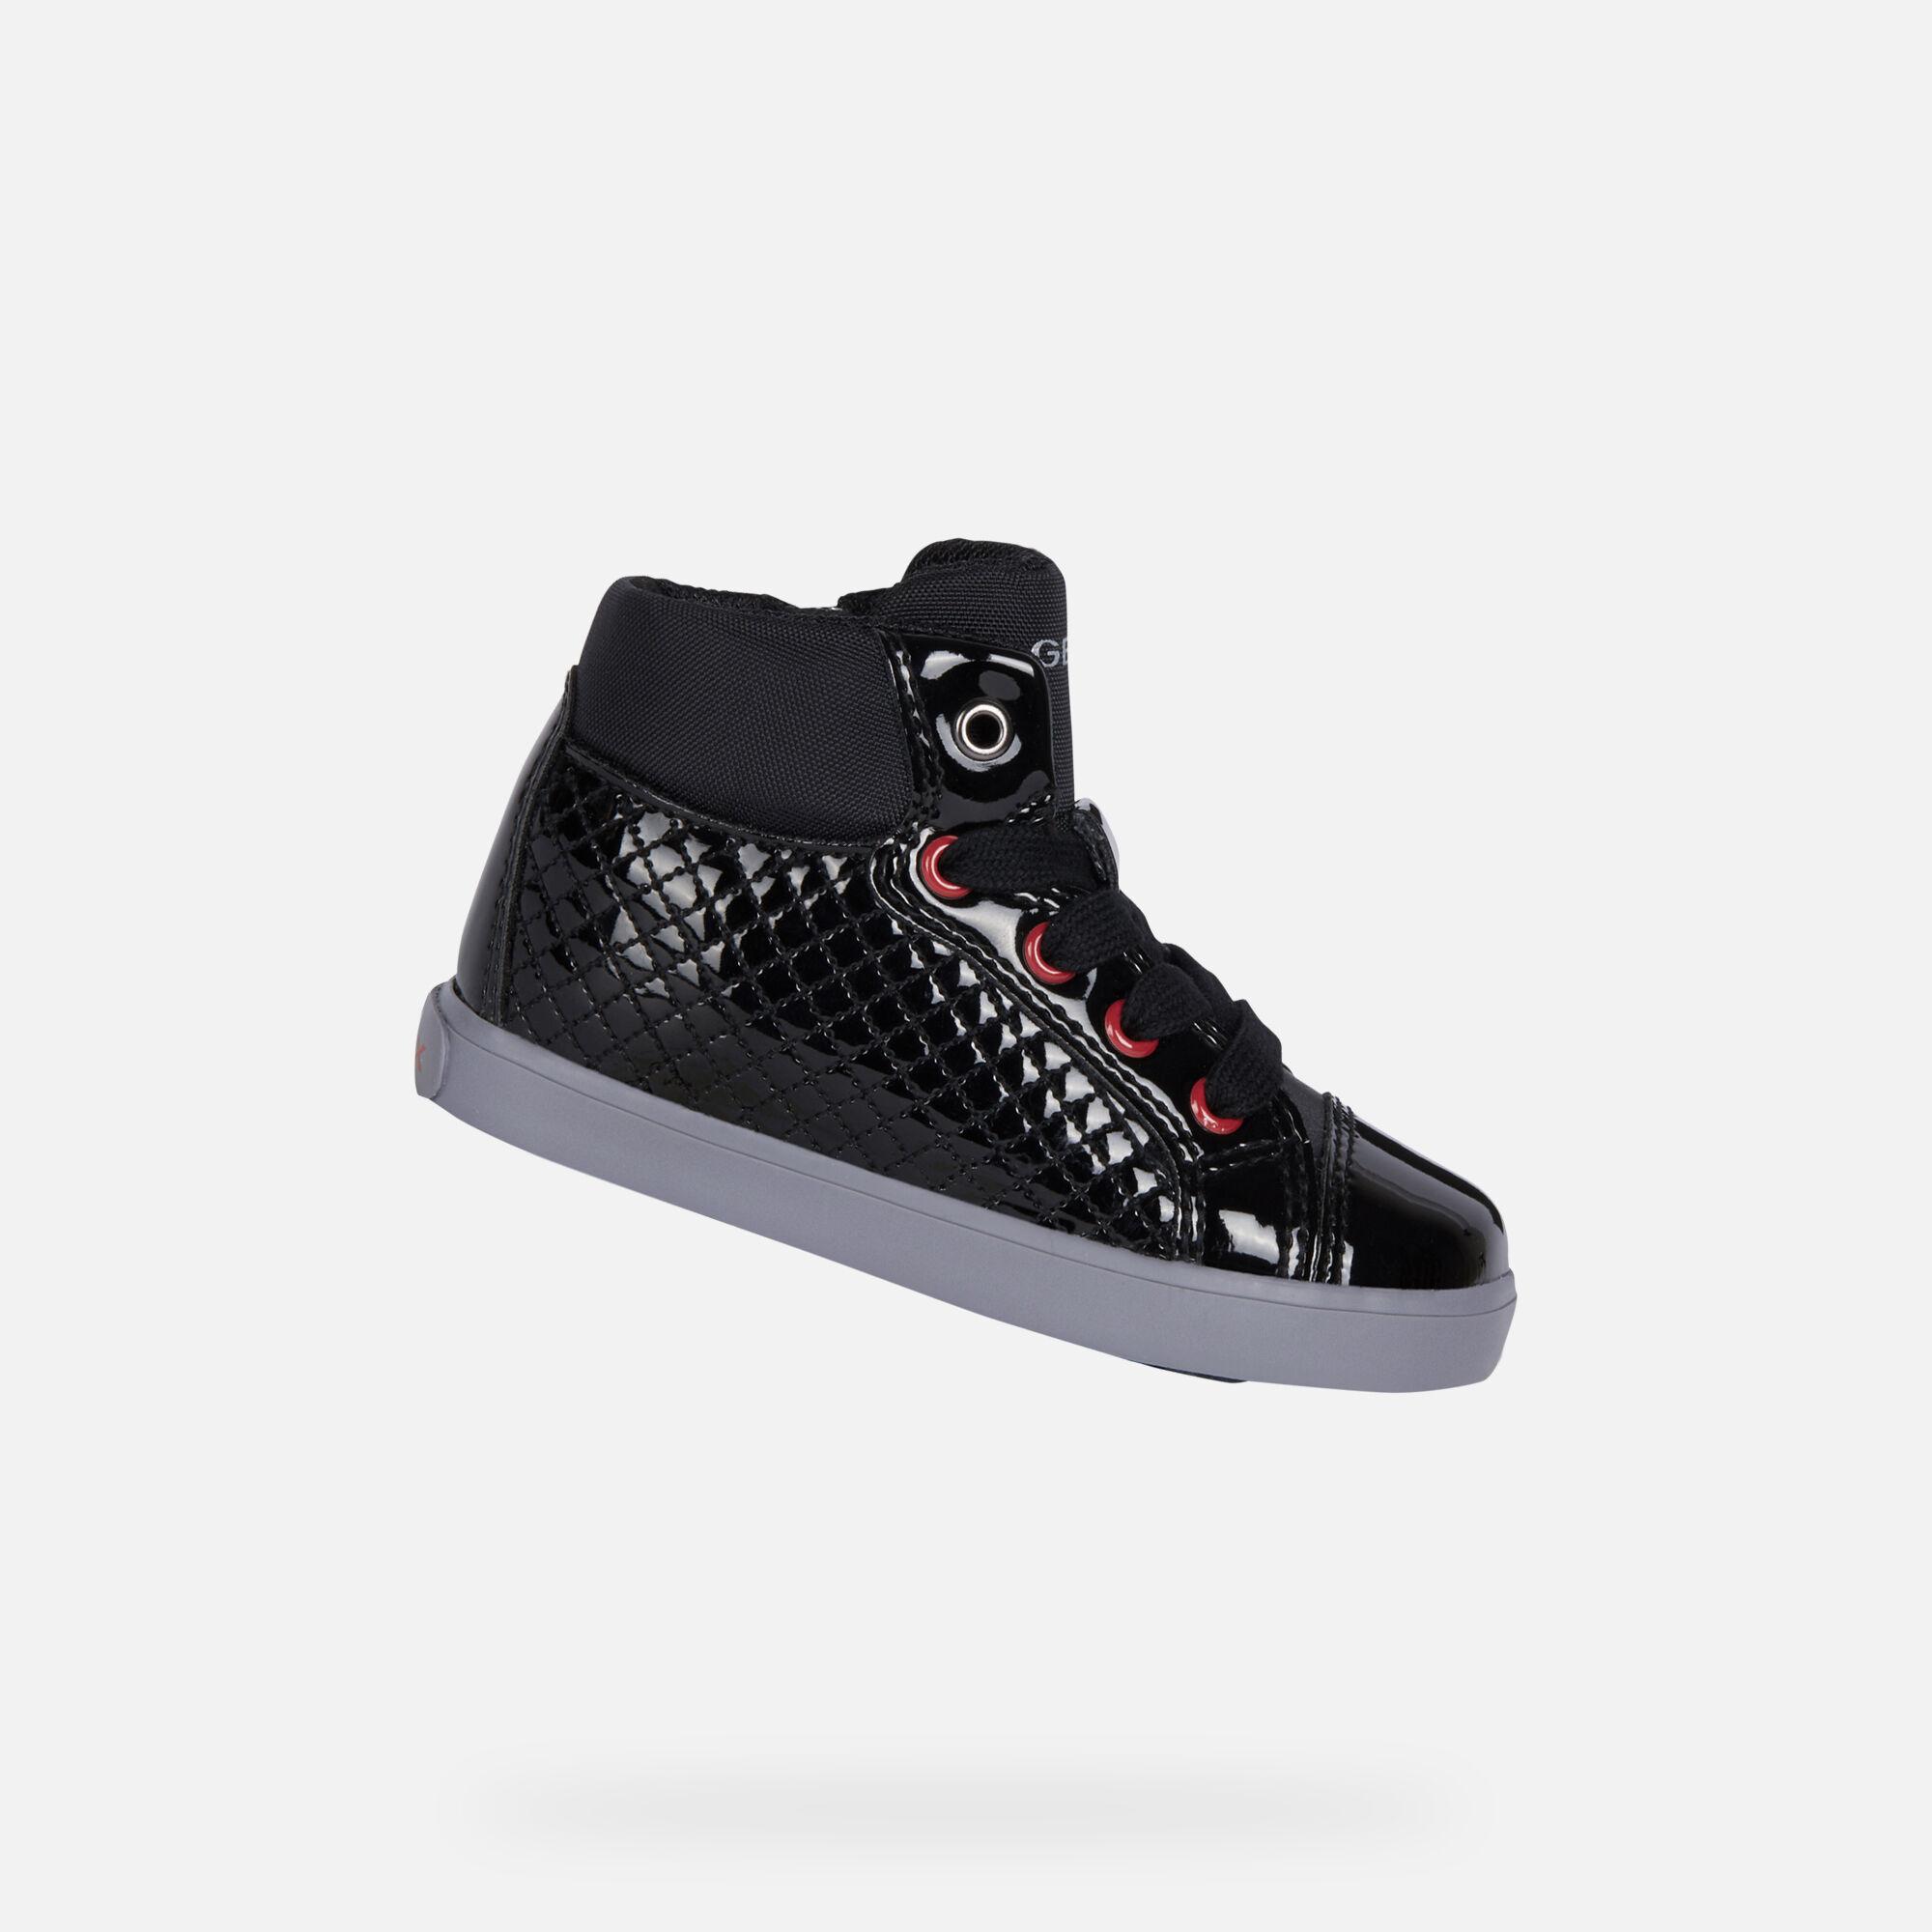 Geox KILWI neugeborenes Mädchen: schwarze Sneakers High